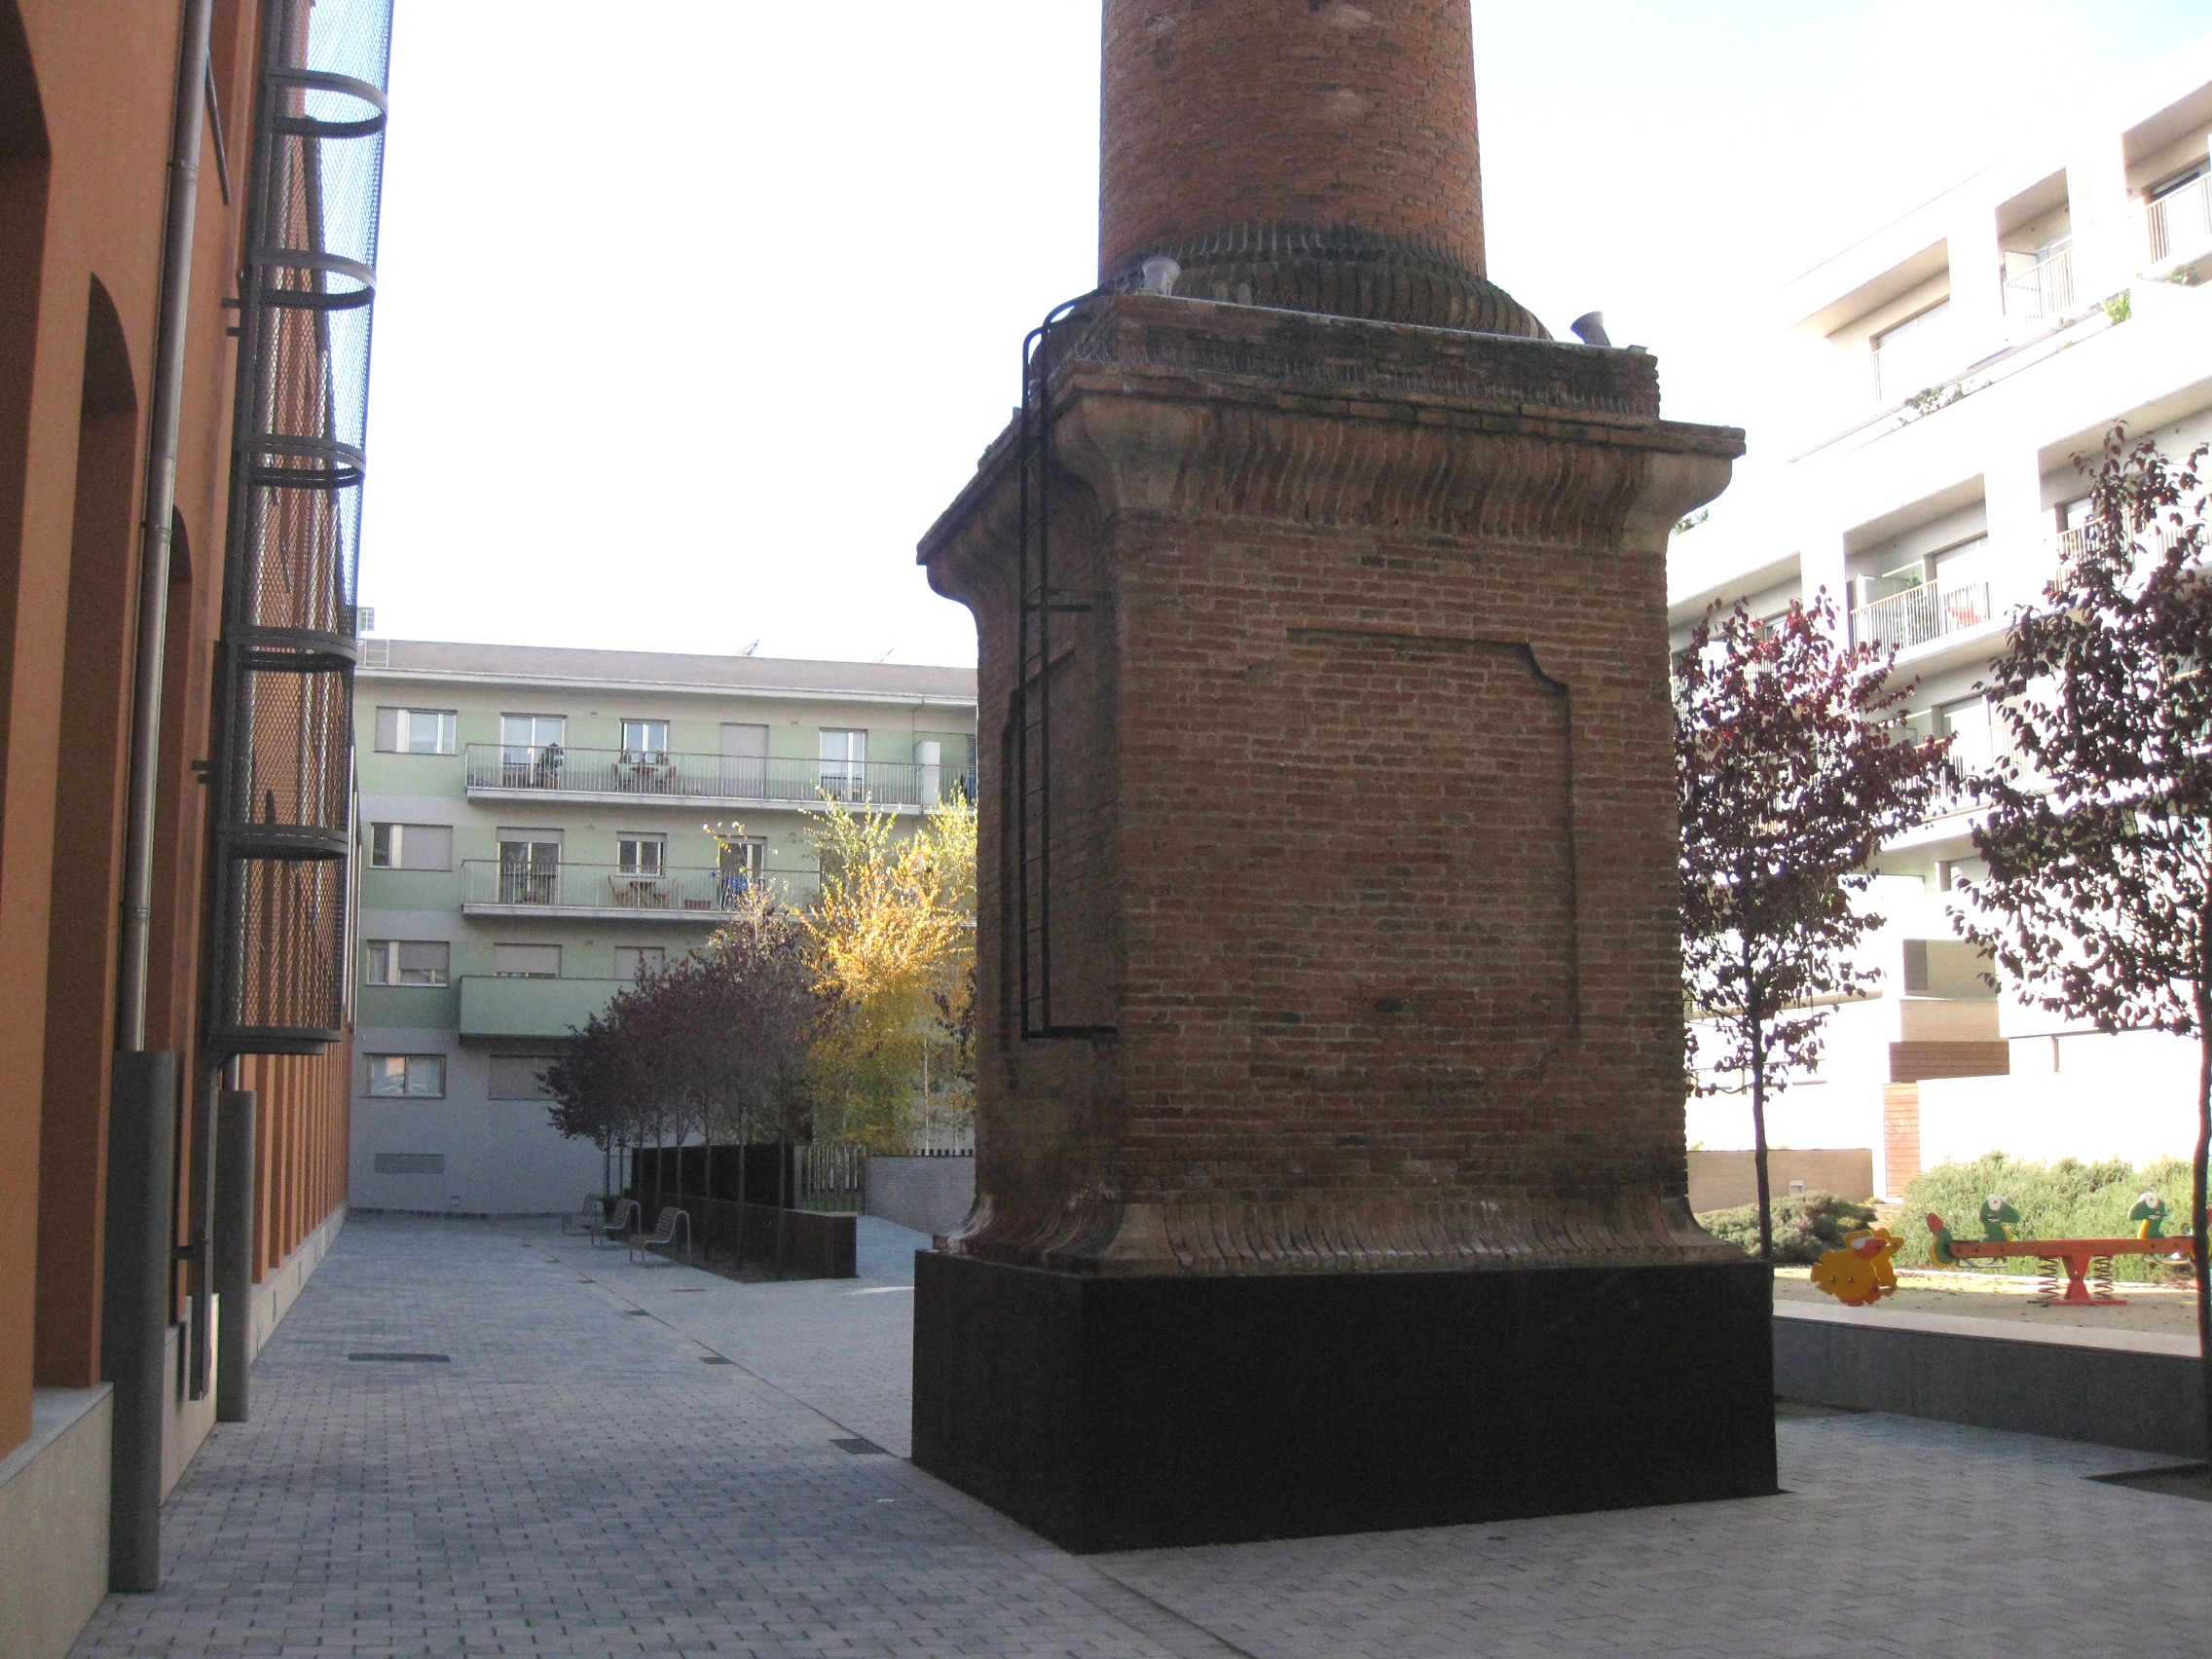 Xemeneia Pont Aurell i Armengol | Wikipedia